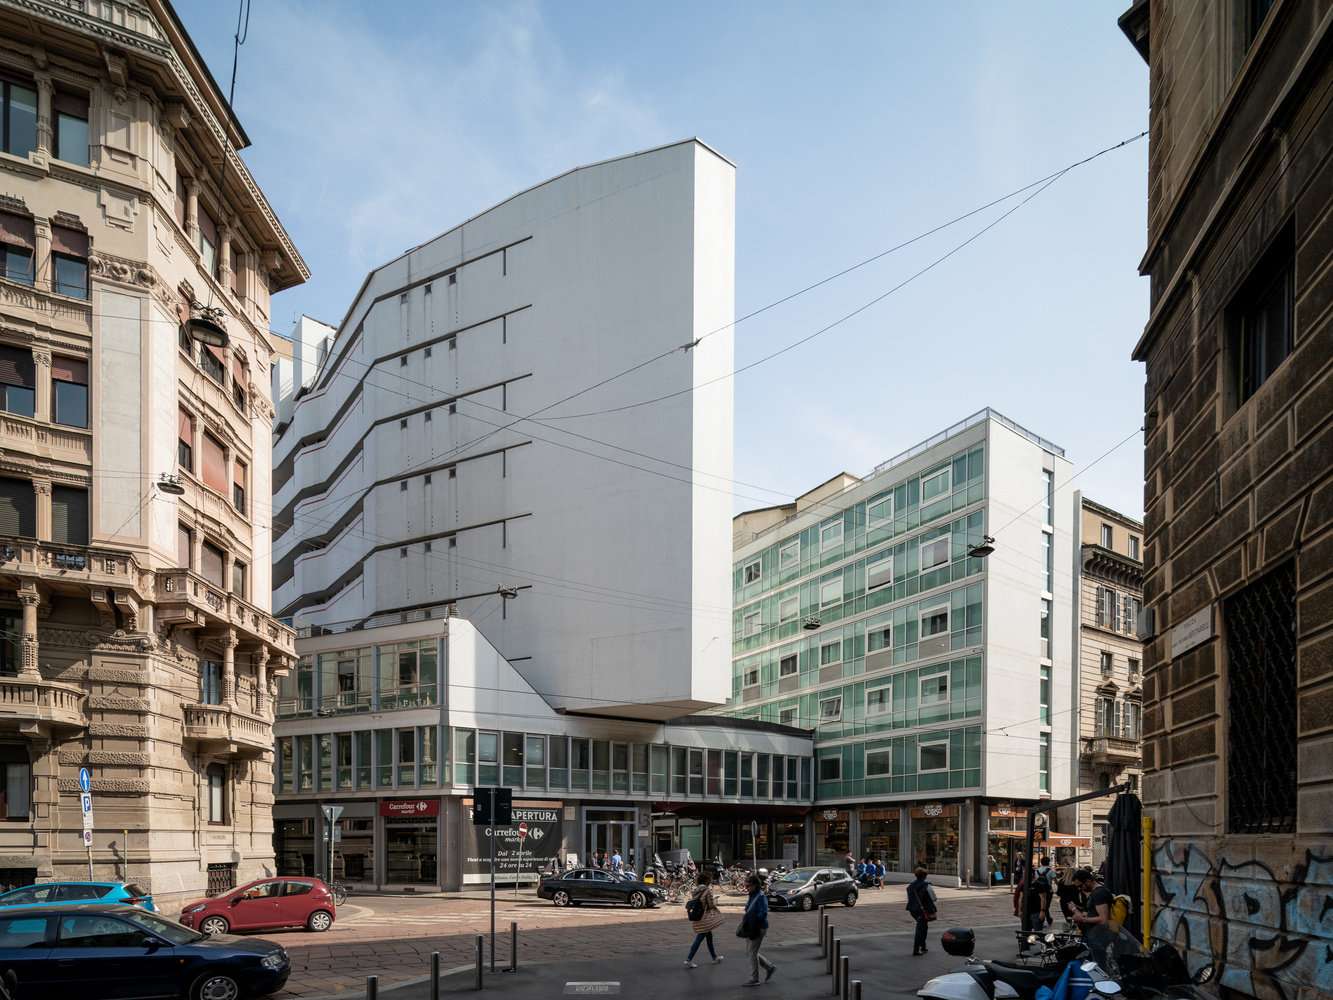 Corso Italia by Sebastian Grundgeir